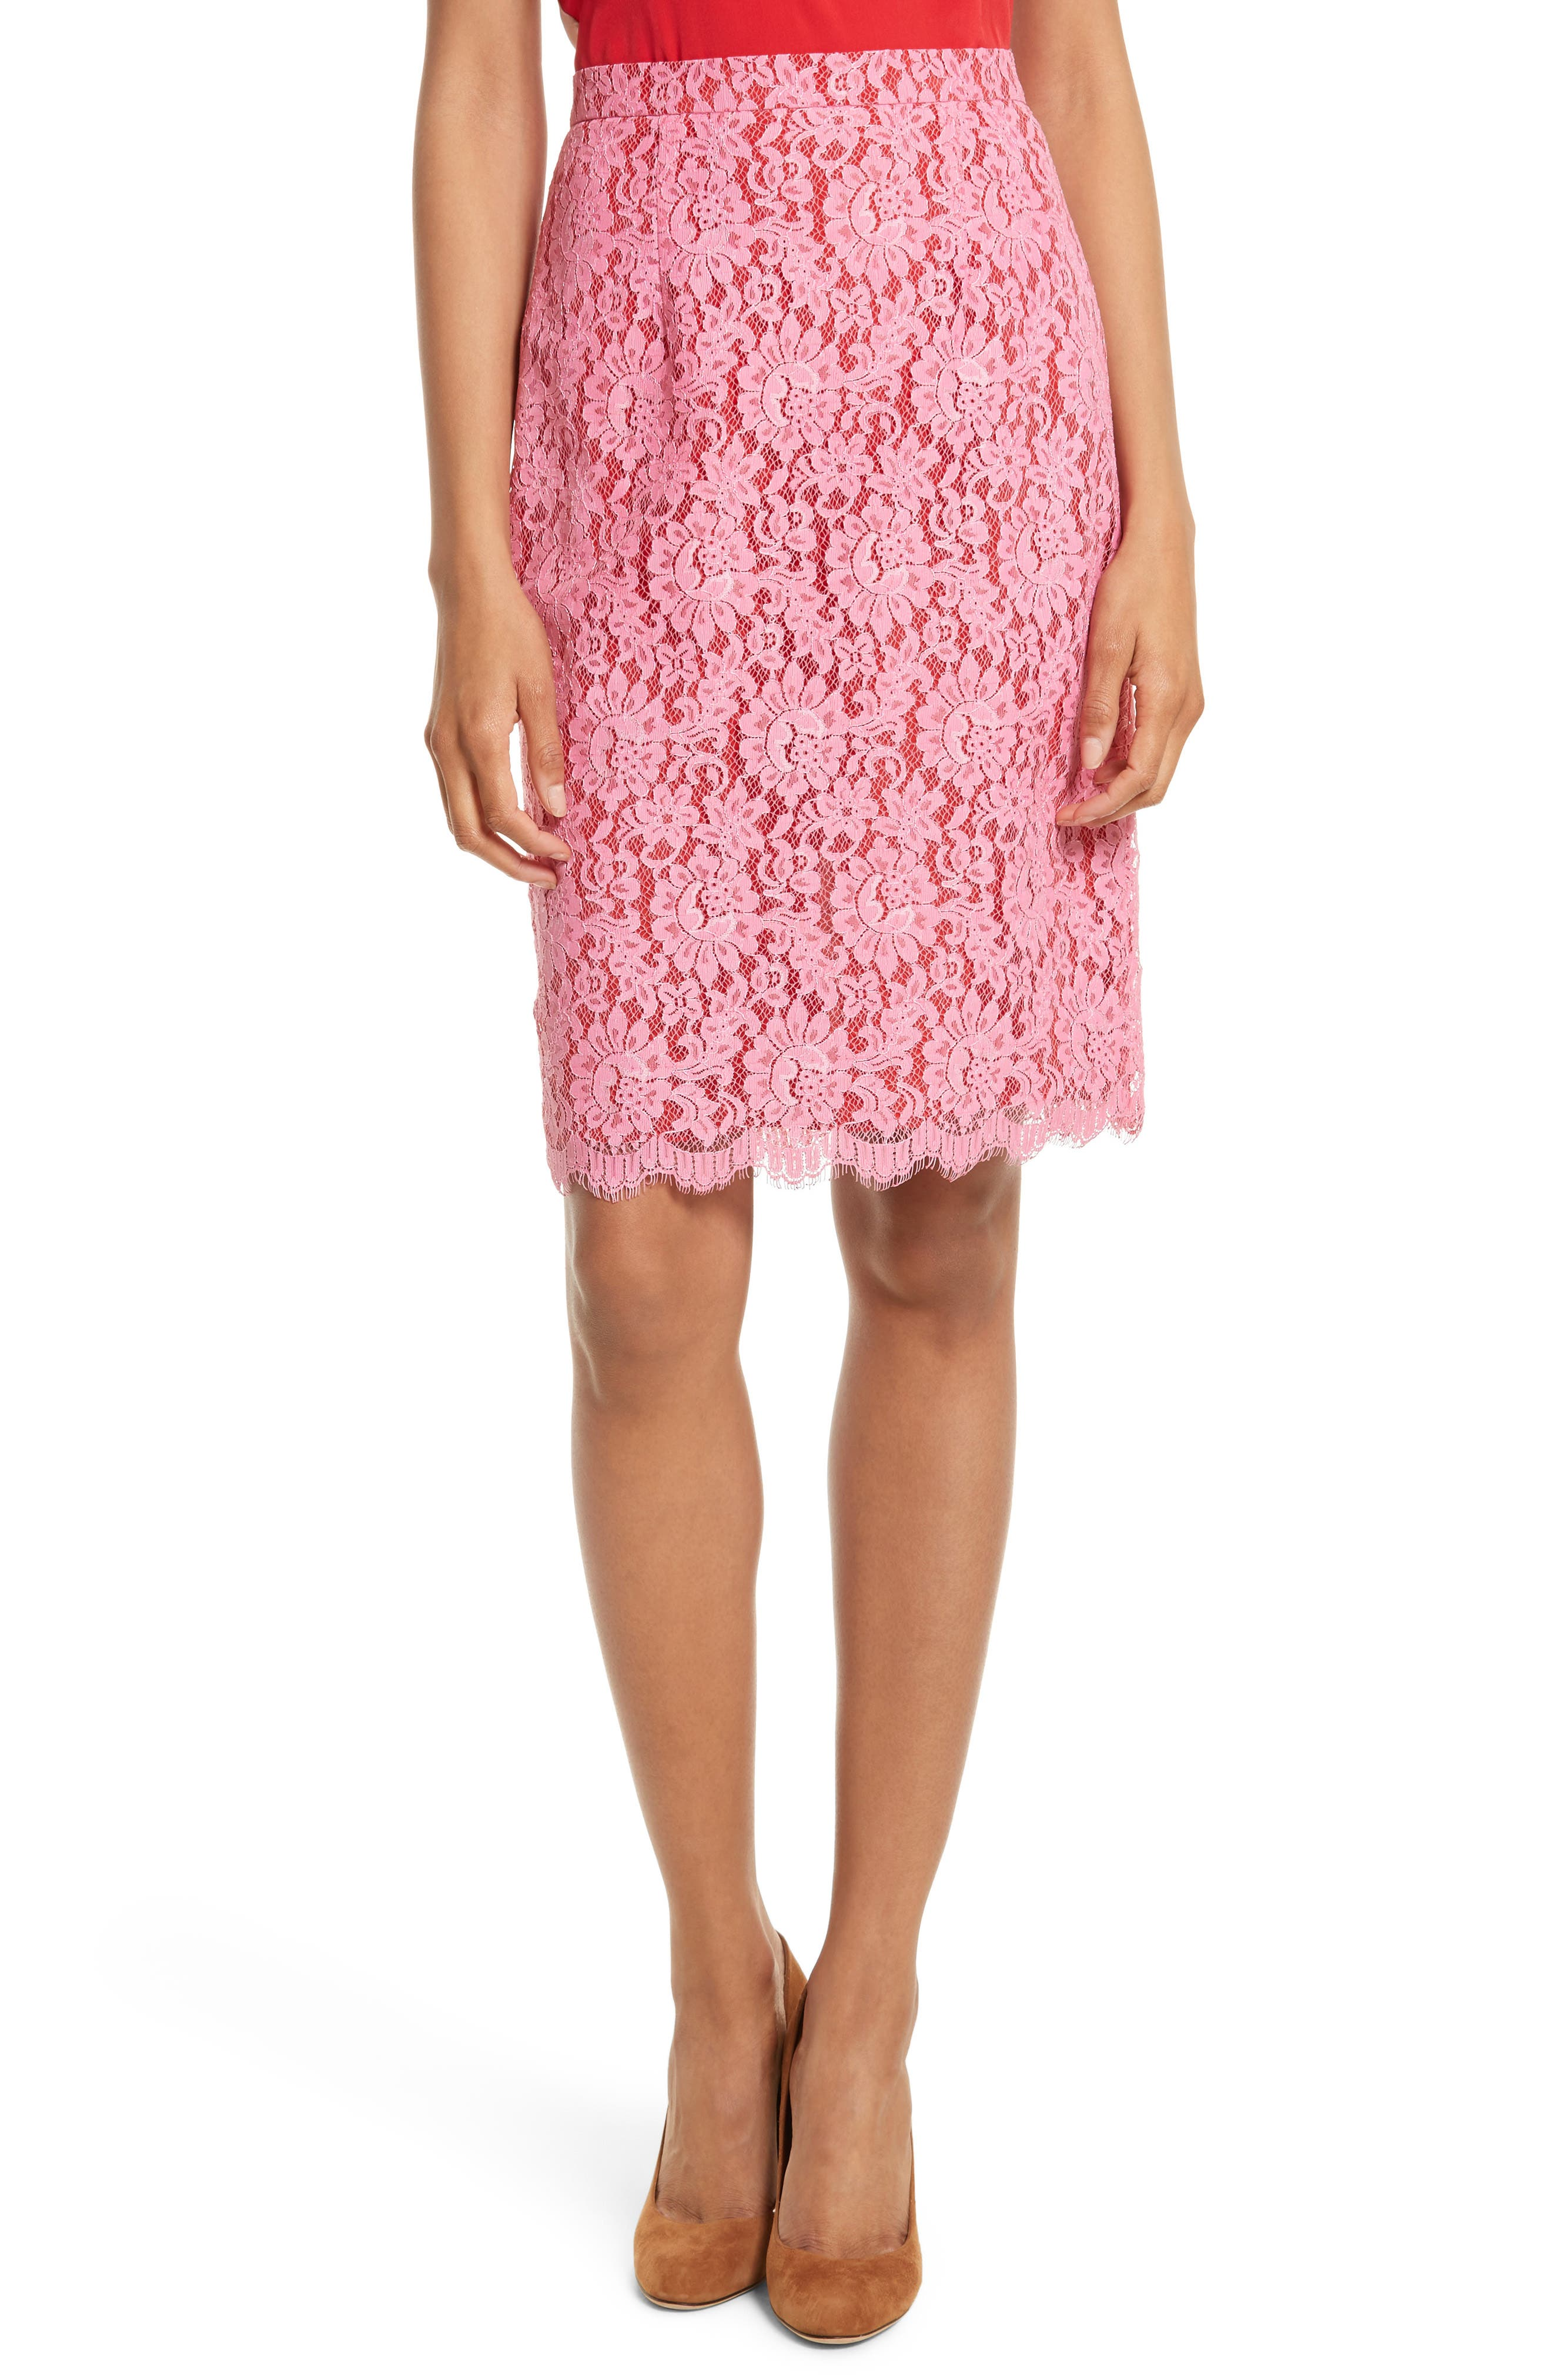 Alternate Image 1 Selected - Diane von Furstenberg Lace Pencil Skirt